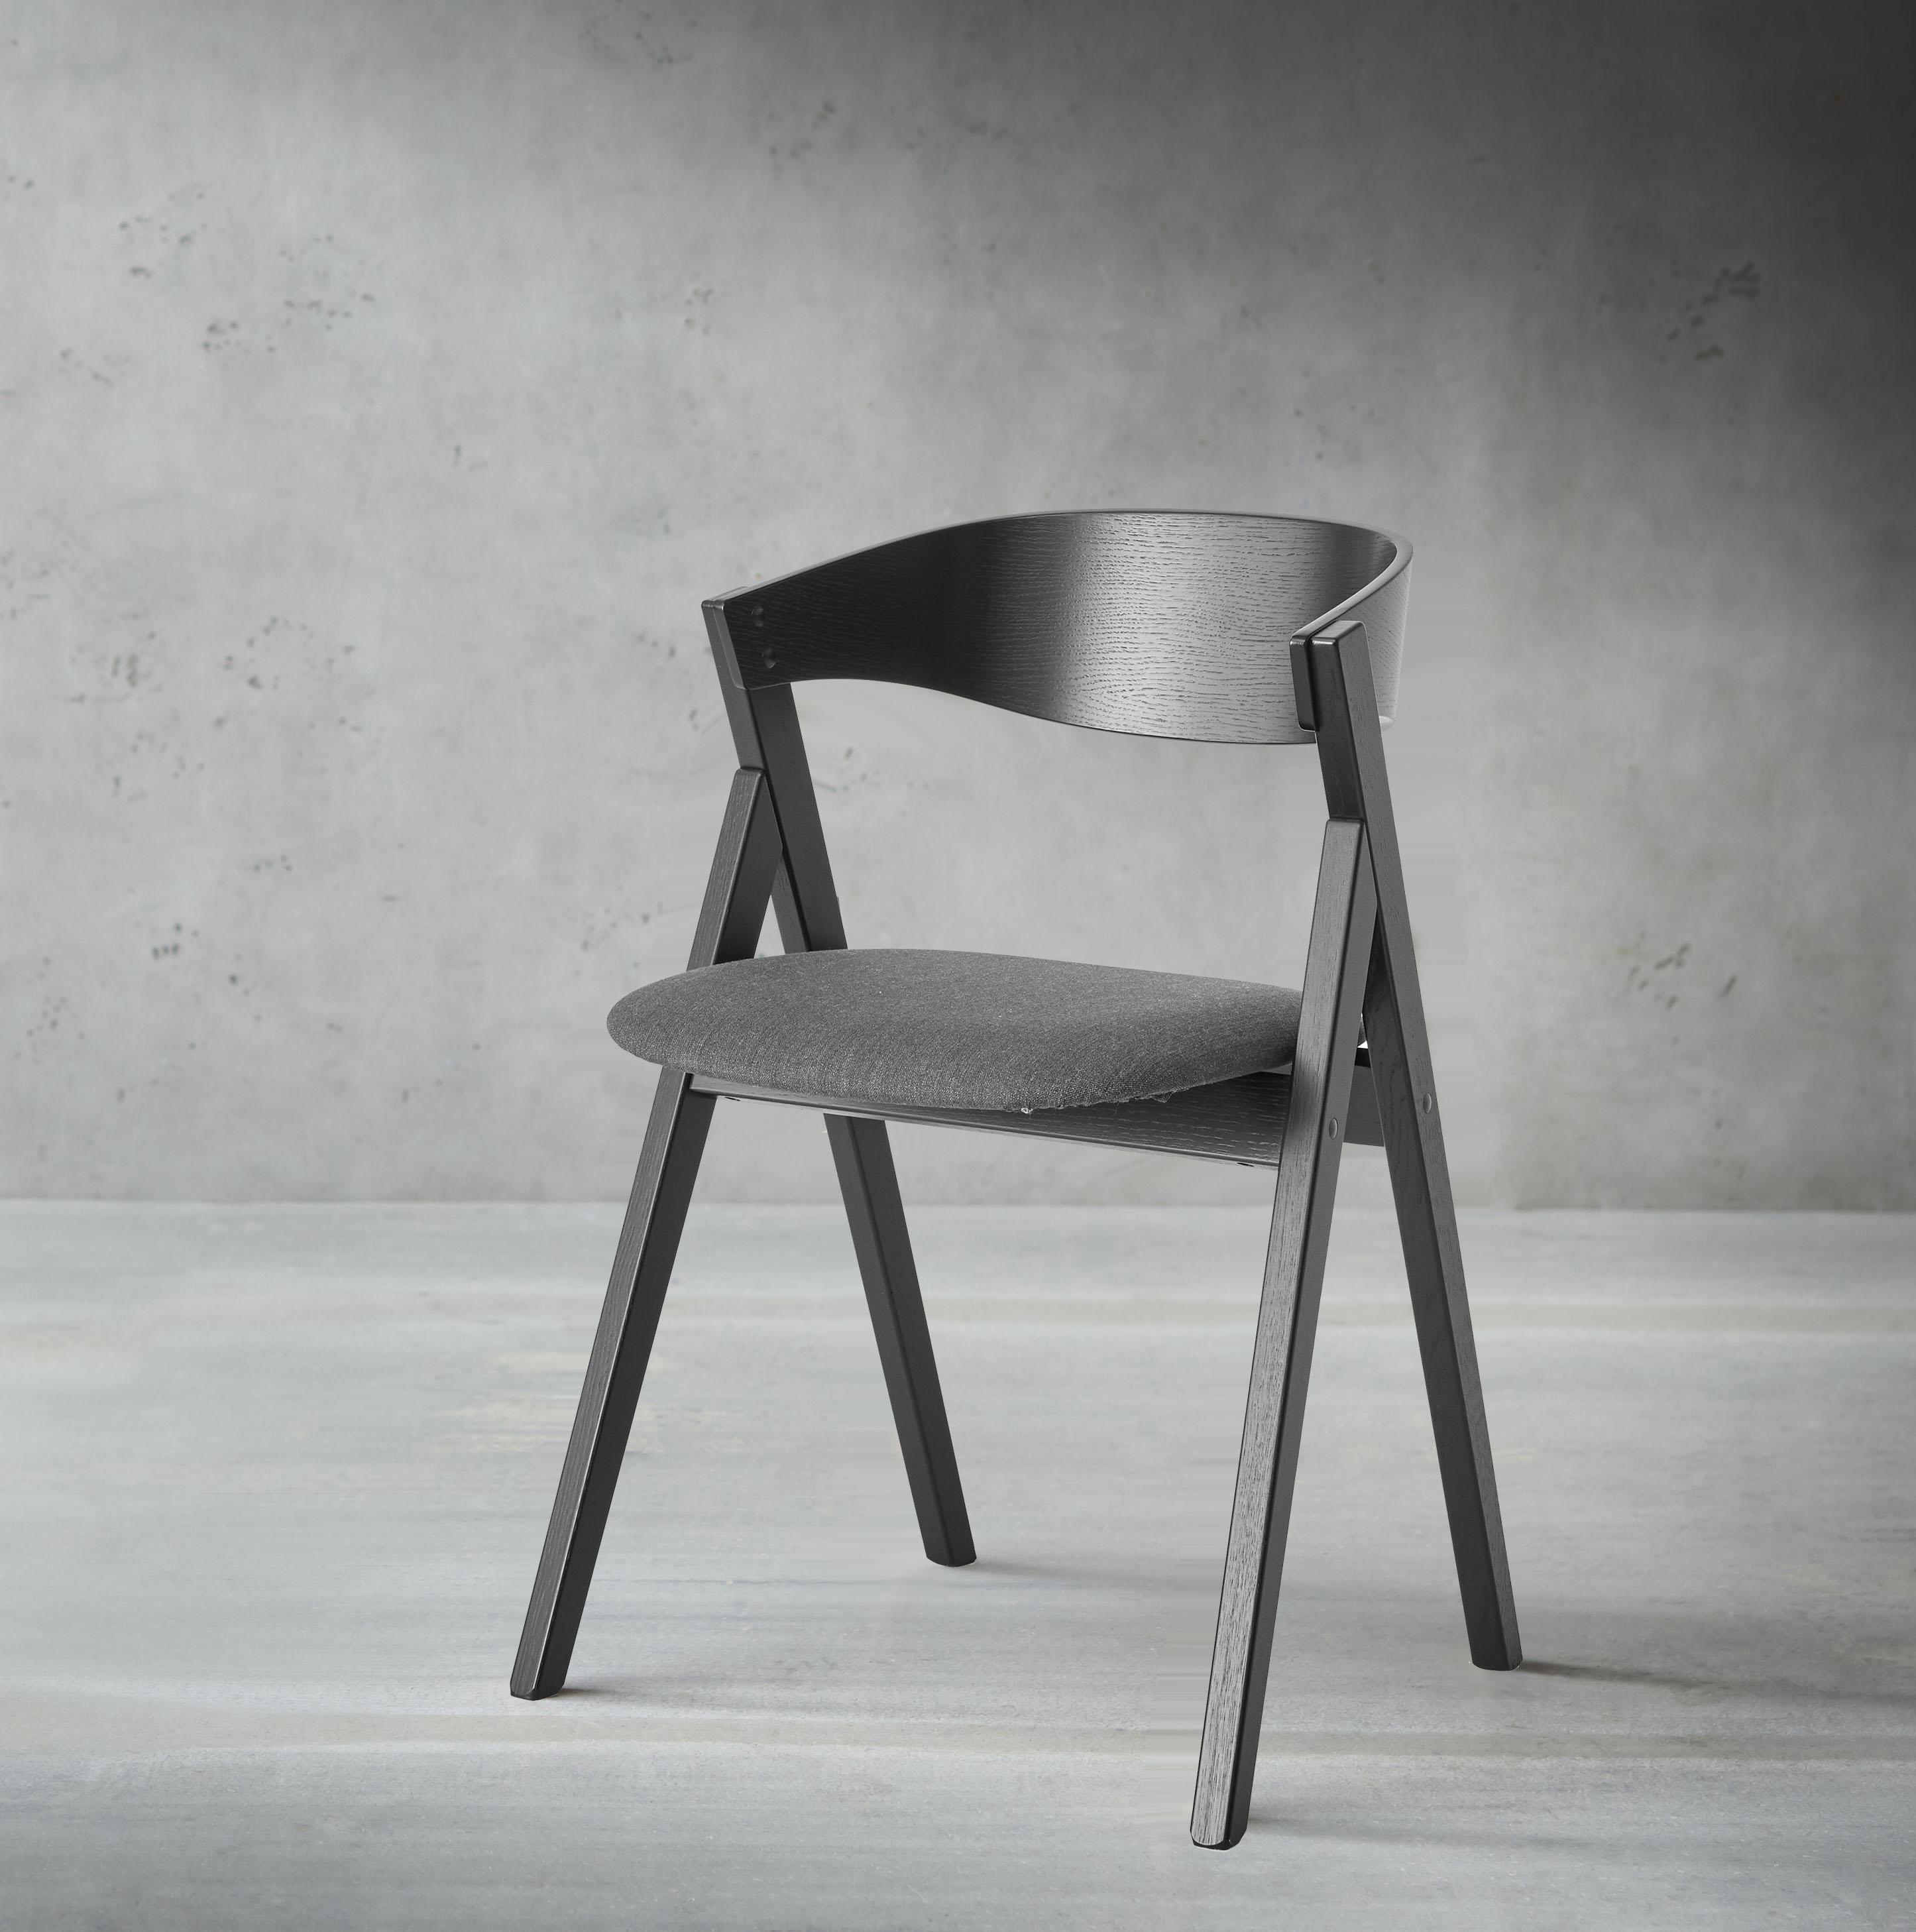 hammel Holzstuhl Findahl schwarz Holzstühle Stühle Sitzbänke